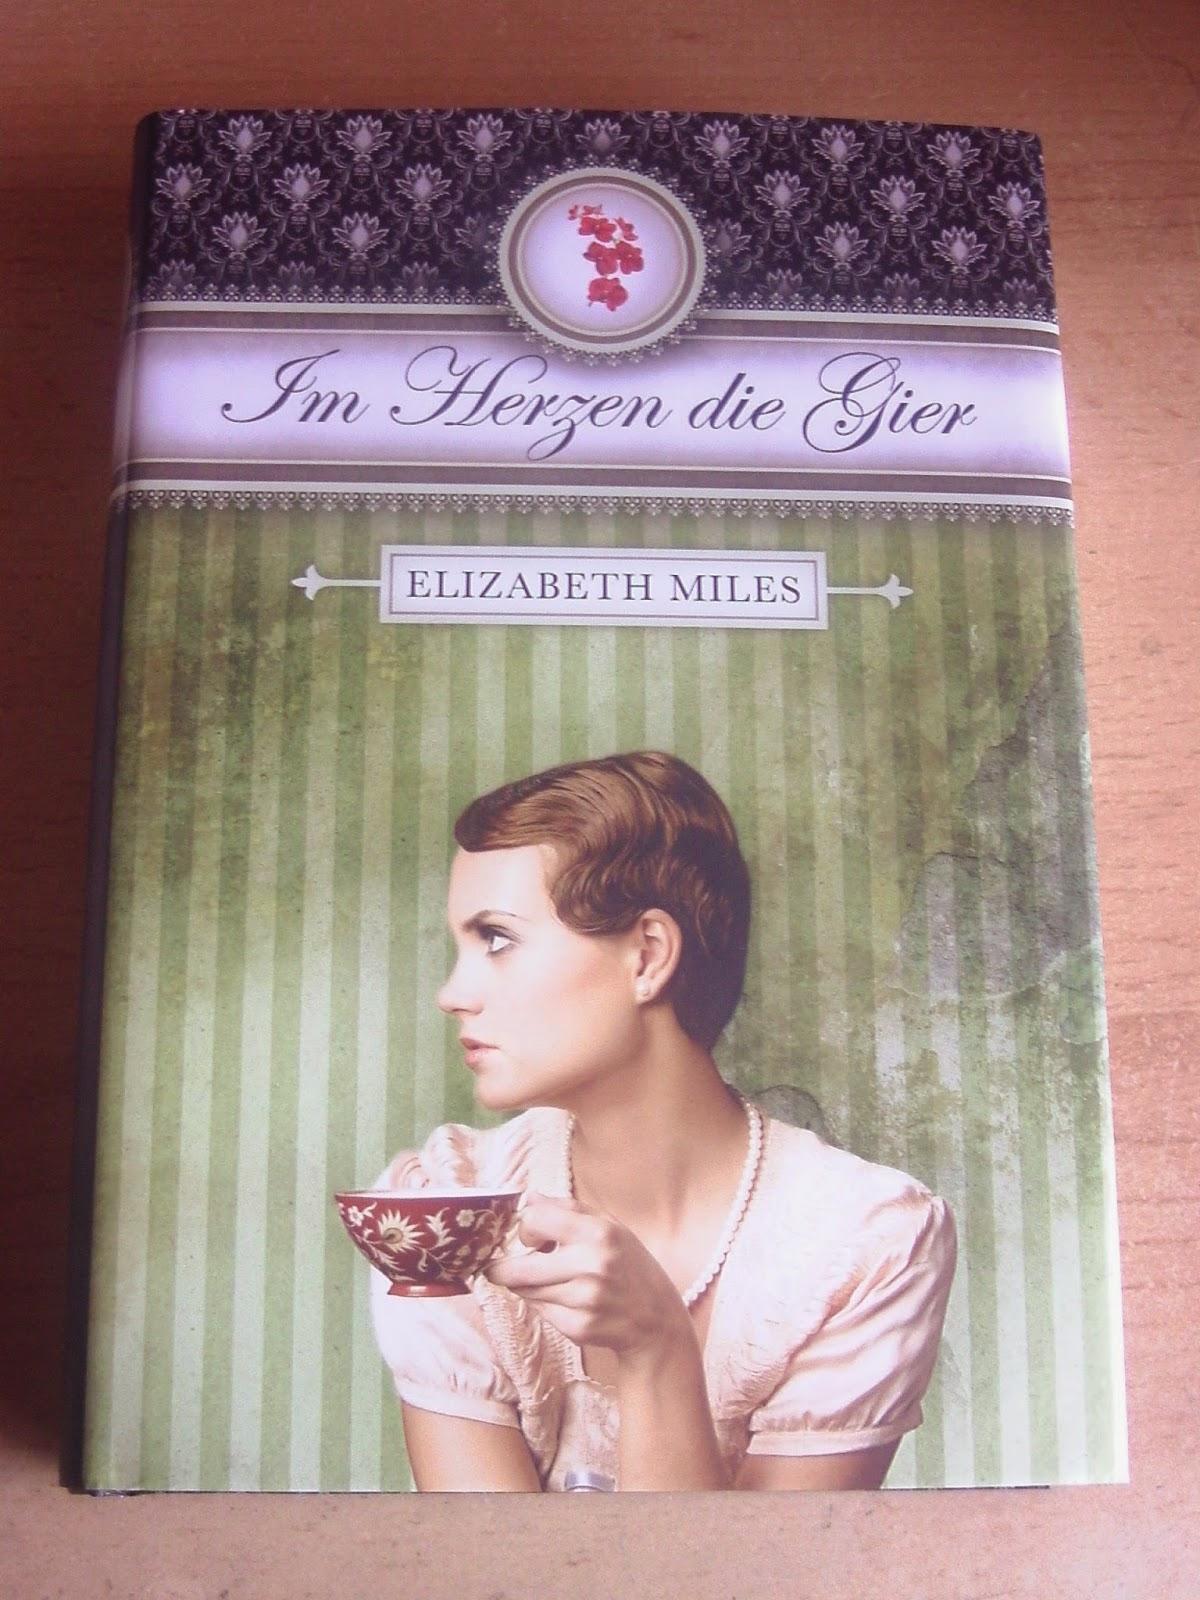 http://www.amazon.de/Furien-Trilogie-Herzen-die-Gier-Band/dp/3785573790/ref=sr_1_2?s=books&ie=UTF8&qid=1426421295&sr=1-2&keywords=im+herzen+die+rache